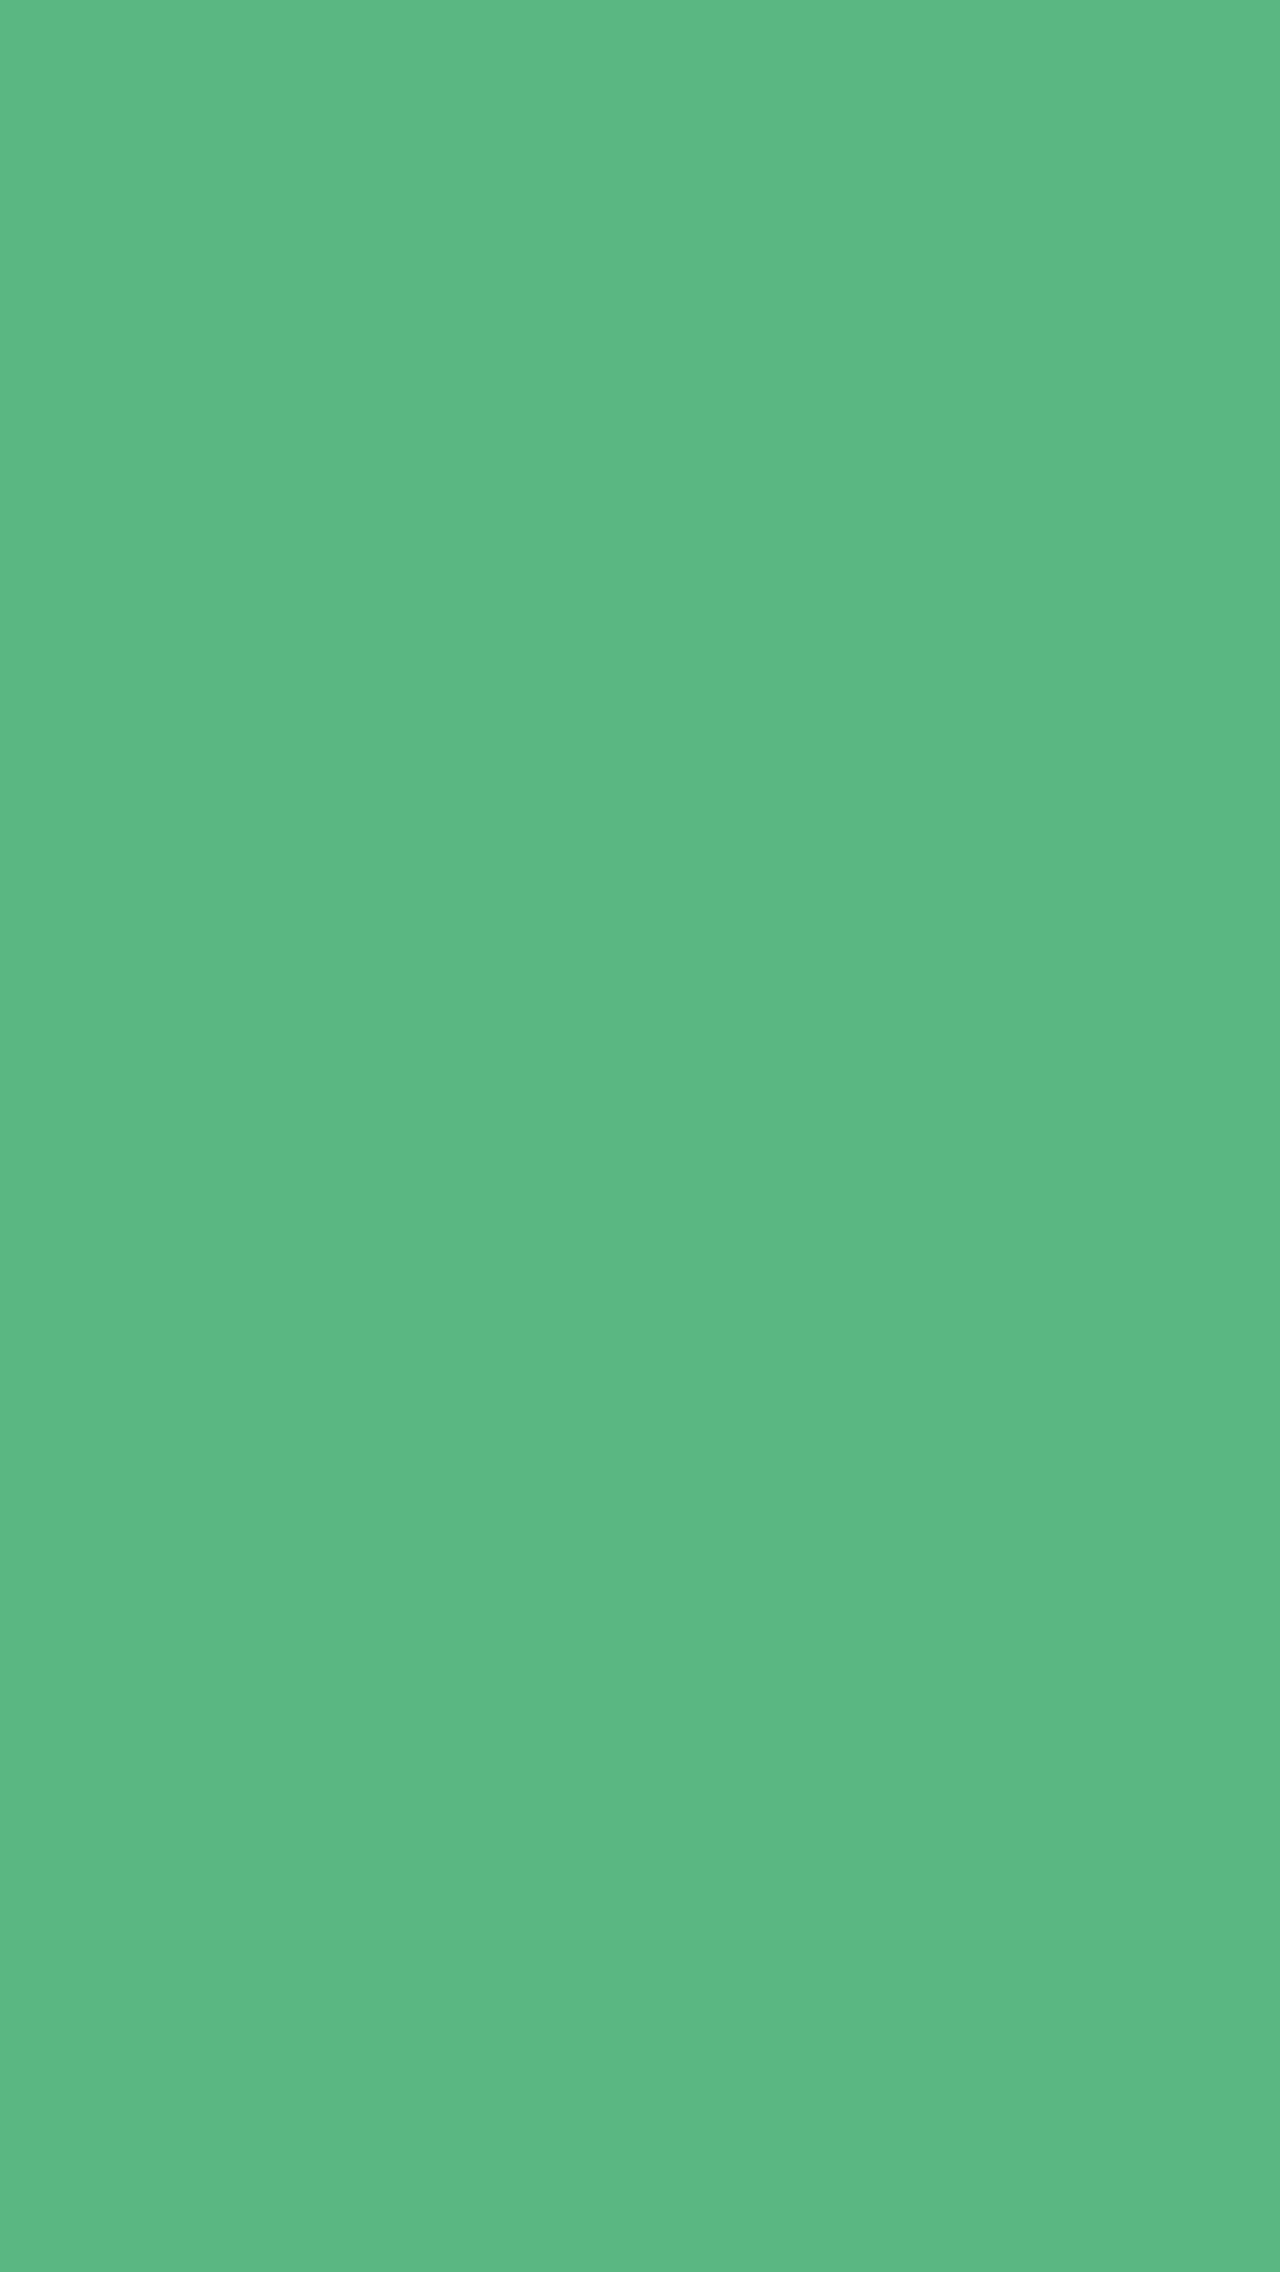 Iphone Backgrounds Fond D Ecran Couleurs Solides Couleurs De Peinture Verte Couleurs De Peinture Bleue Peinture Bleu